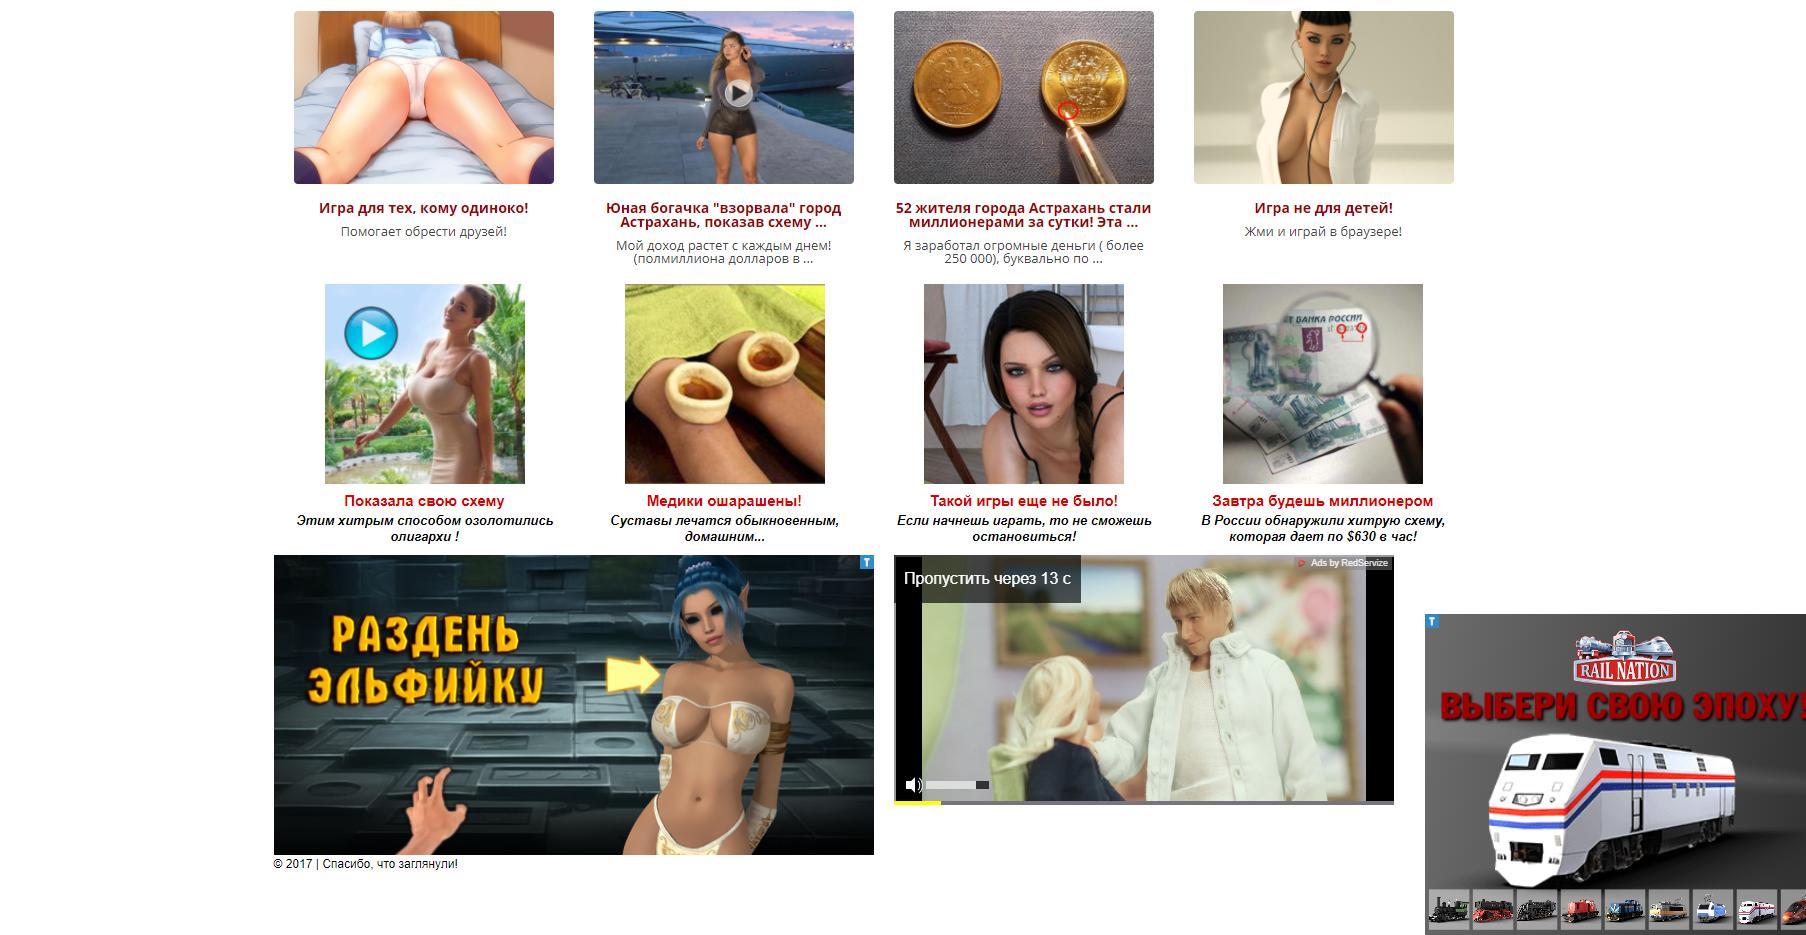 ads by Exinariuminix.info